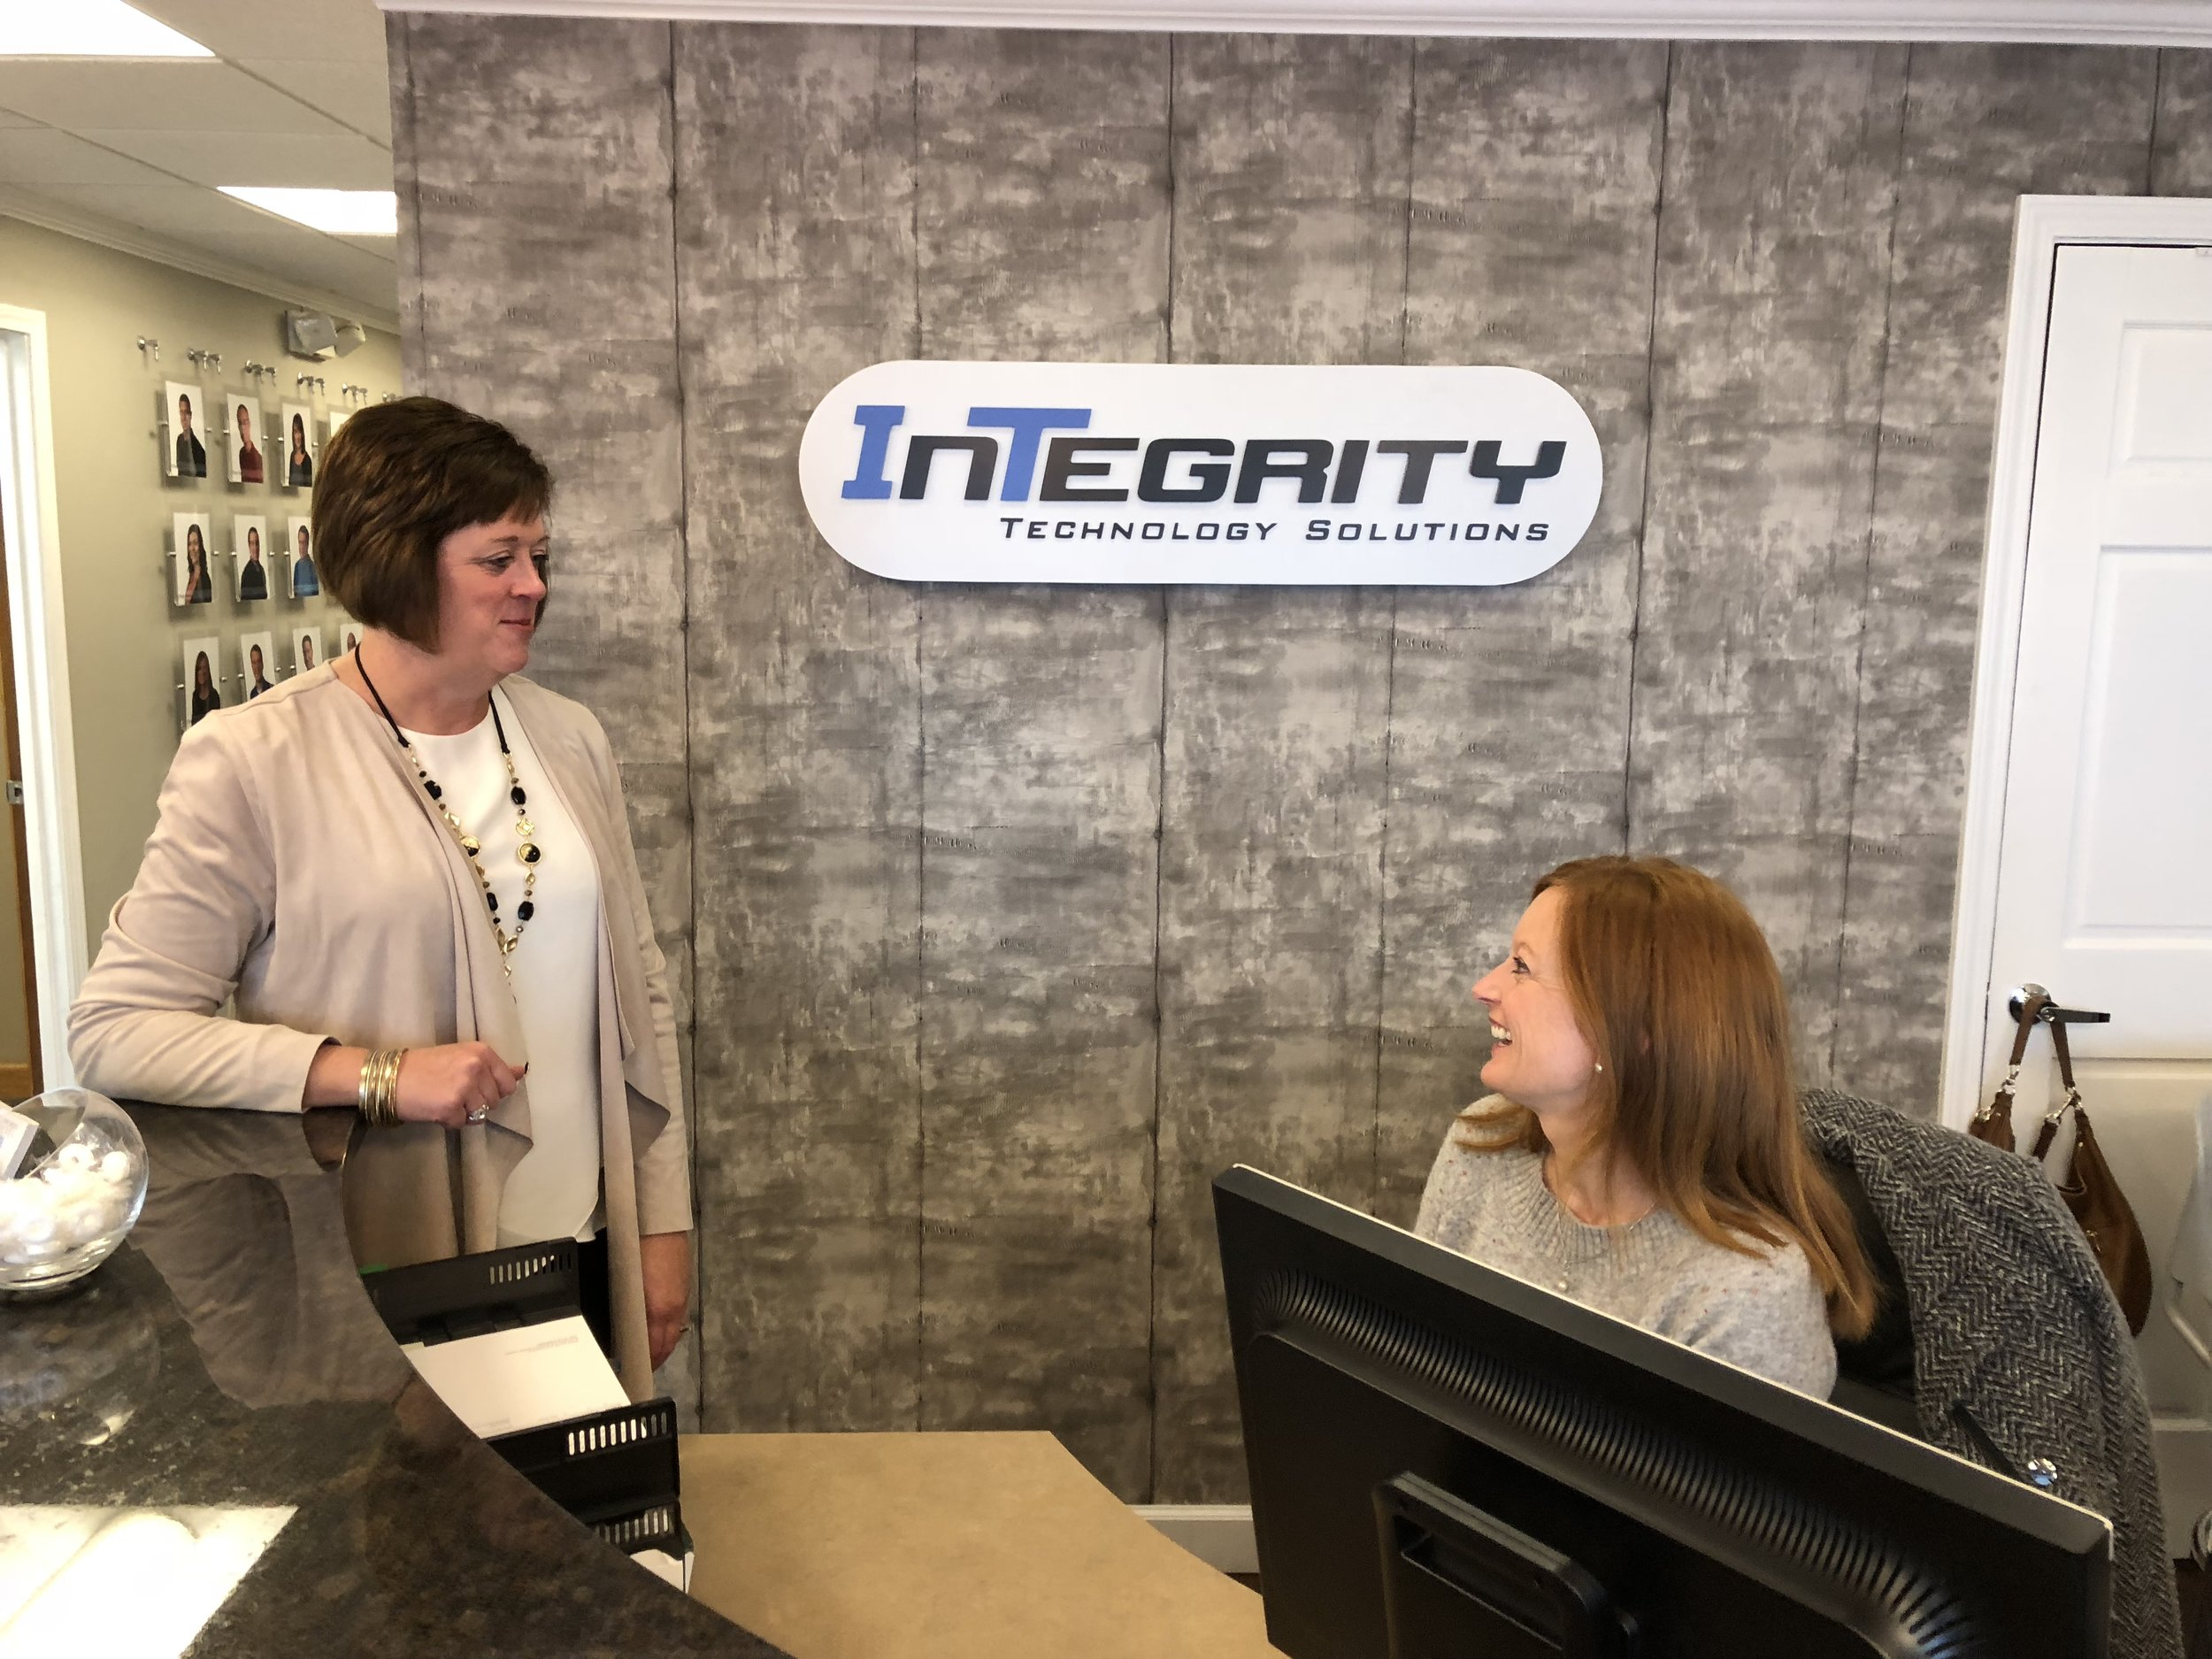 Mary Bennet Henrichs talks business with associate Cindy Giessinger at Integrity Technology Solutions. (Credit: Erik Prenzler)